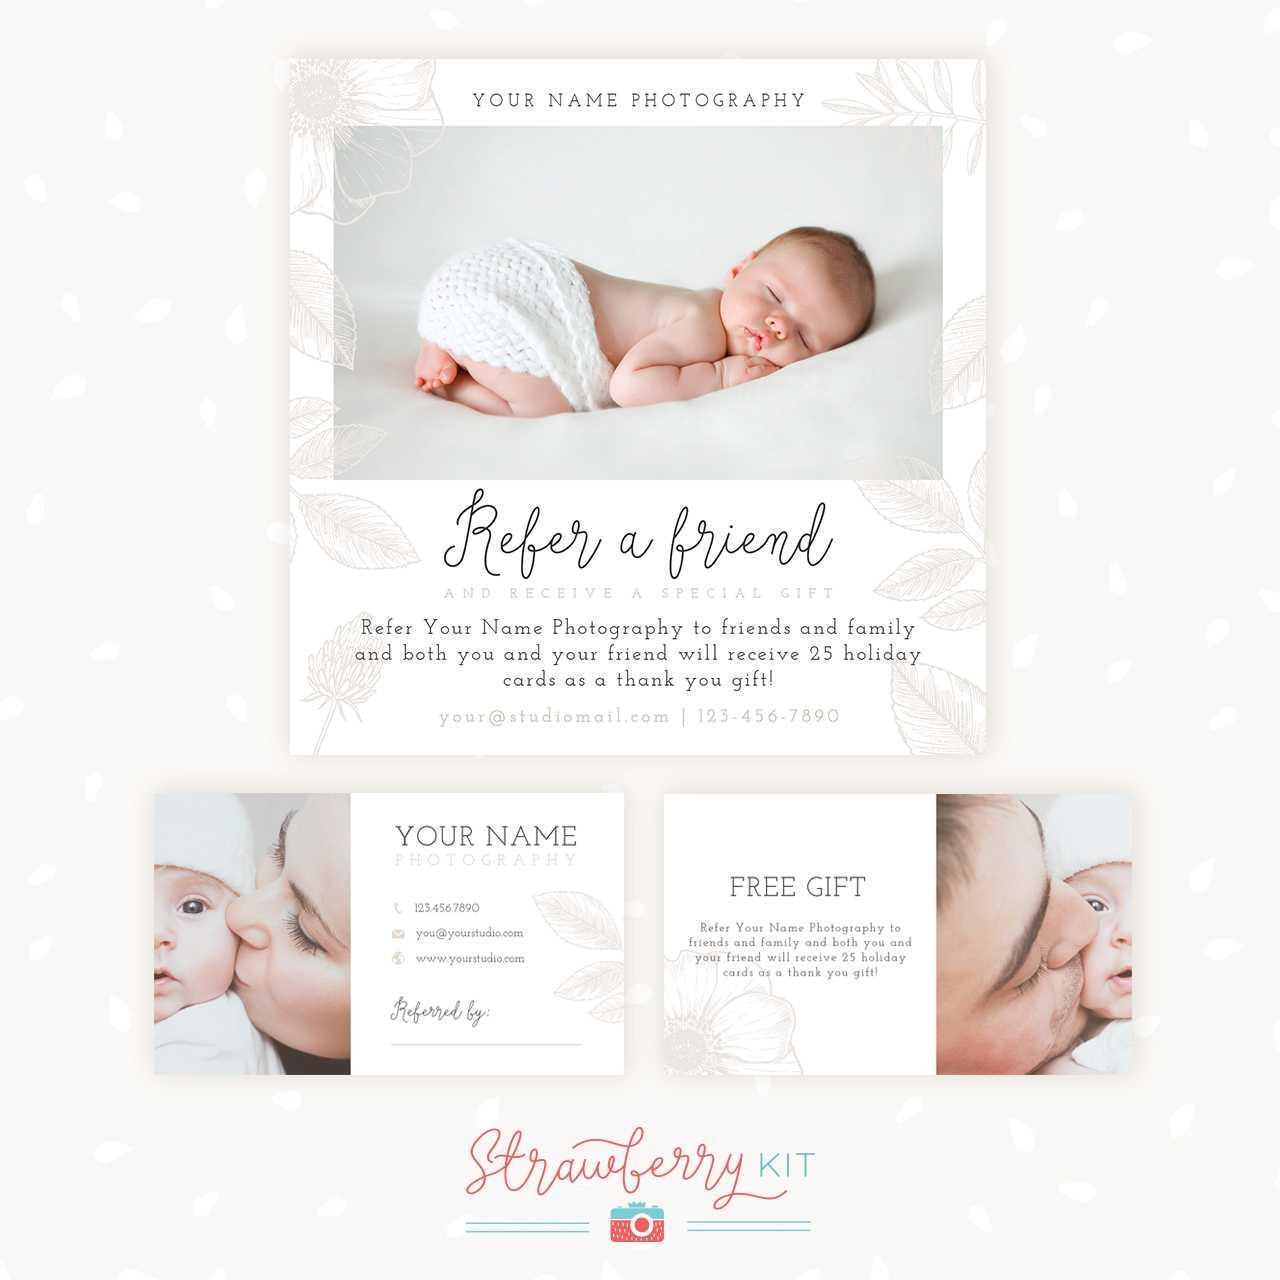 Refer A Friend Photography Template | Bonus Business Cards regarding Photography Referral Card Templates